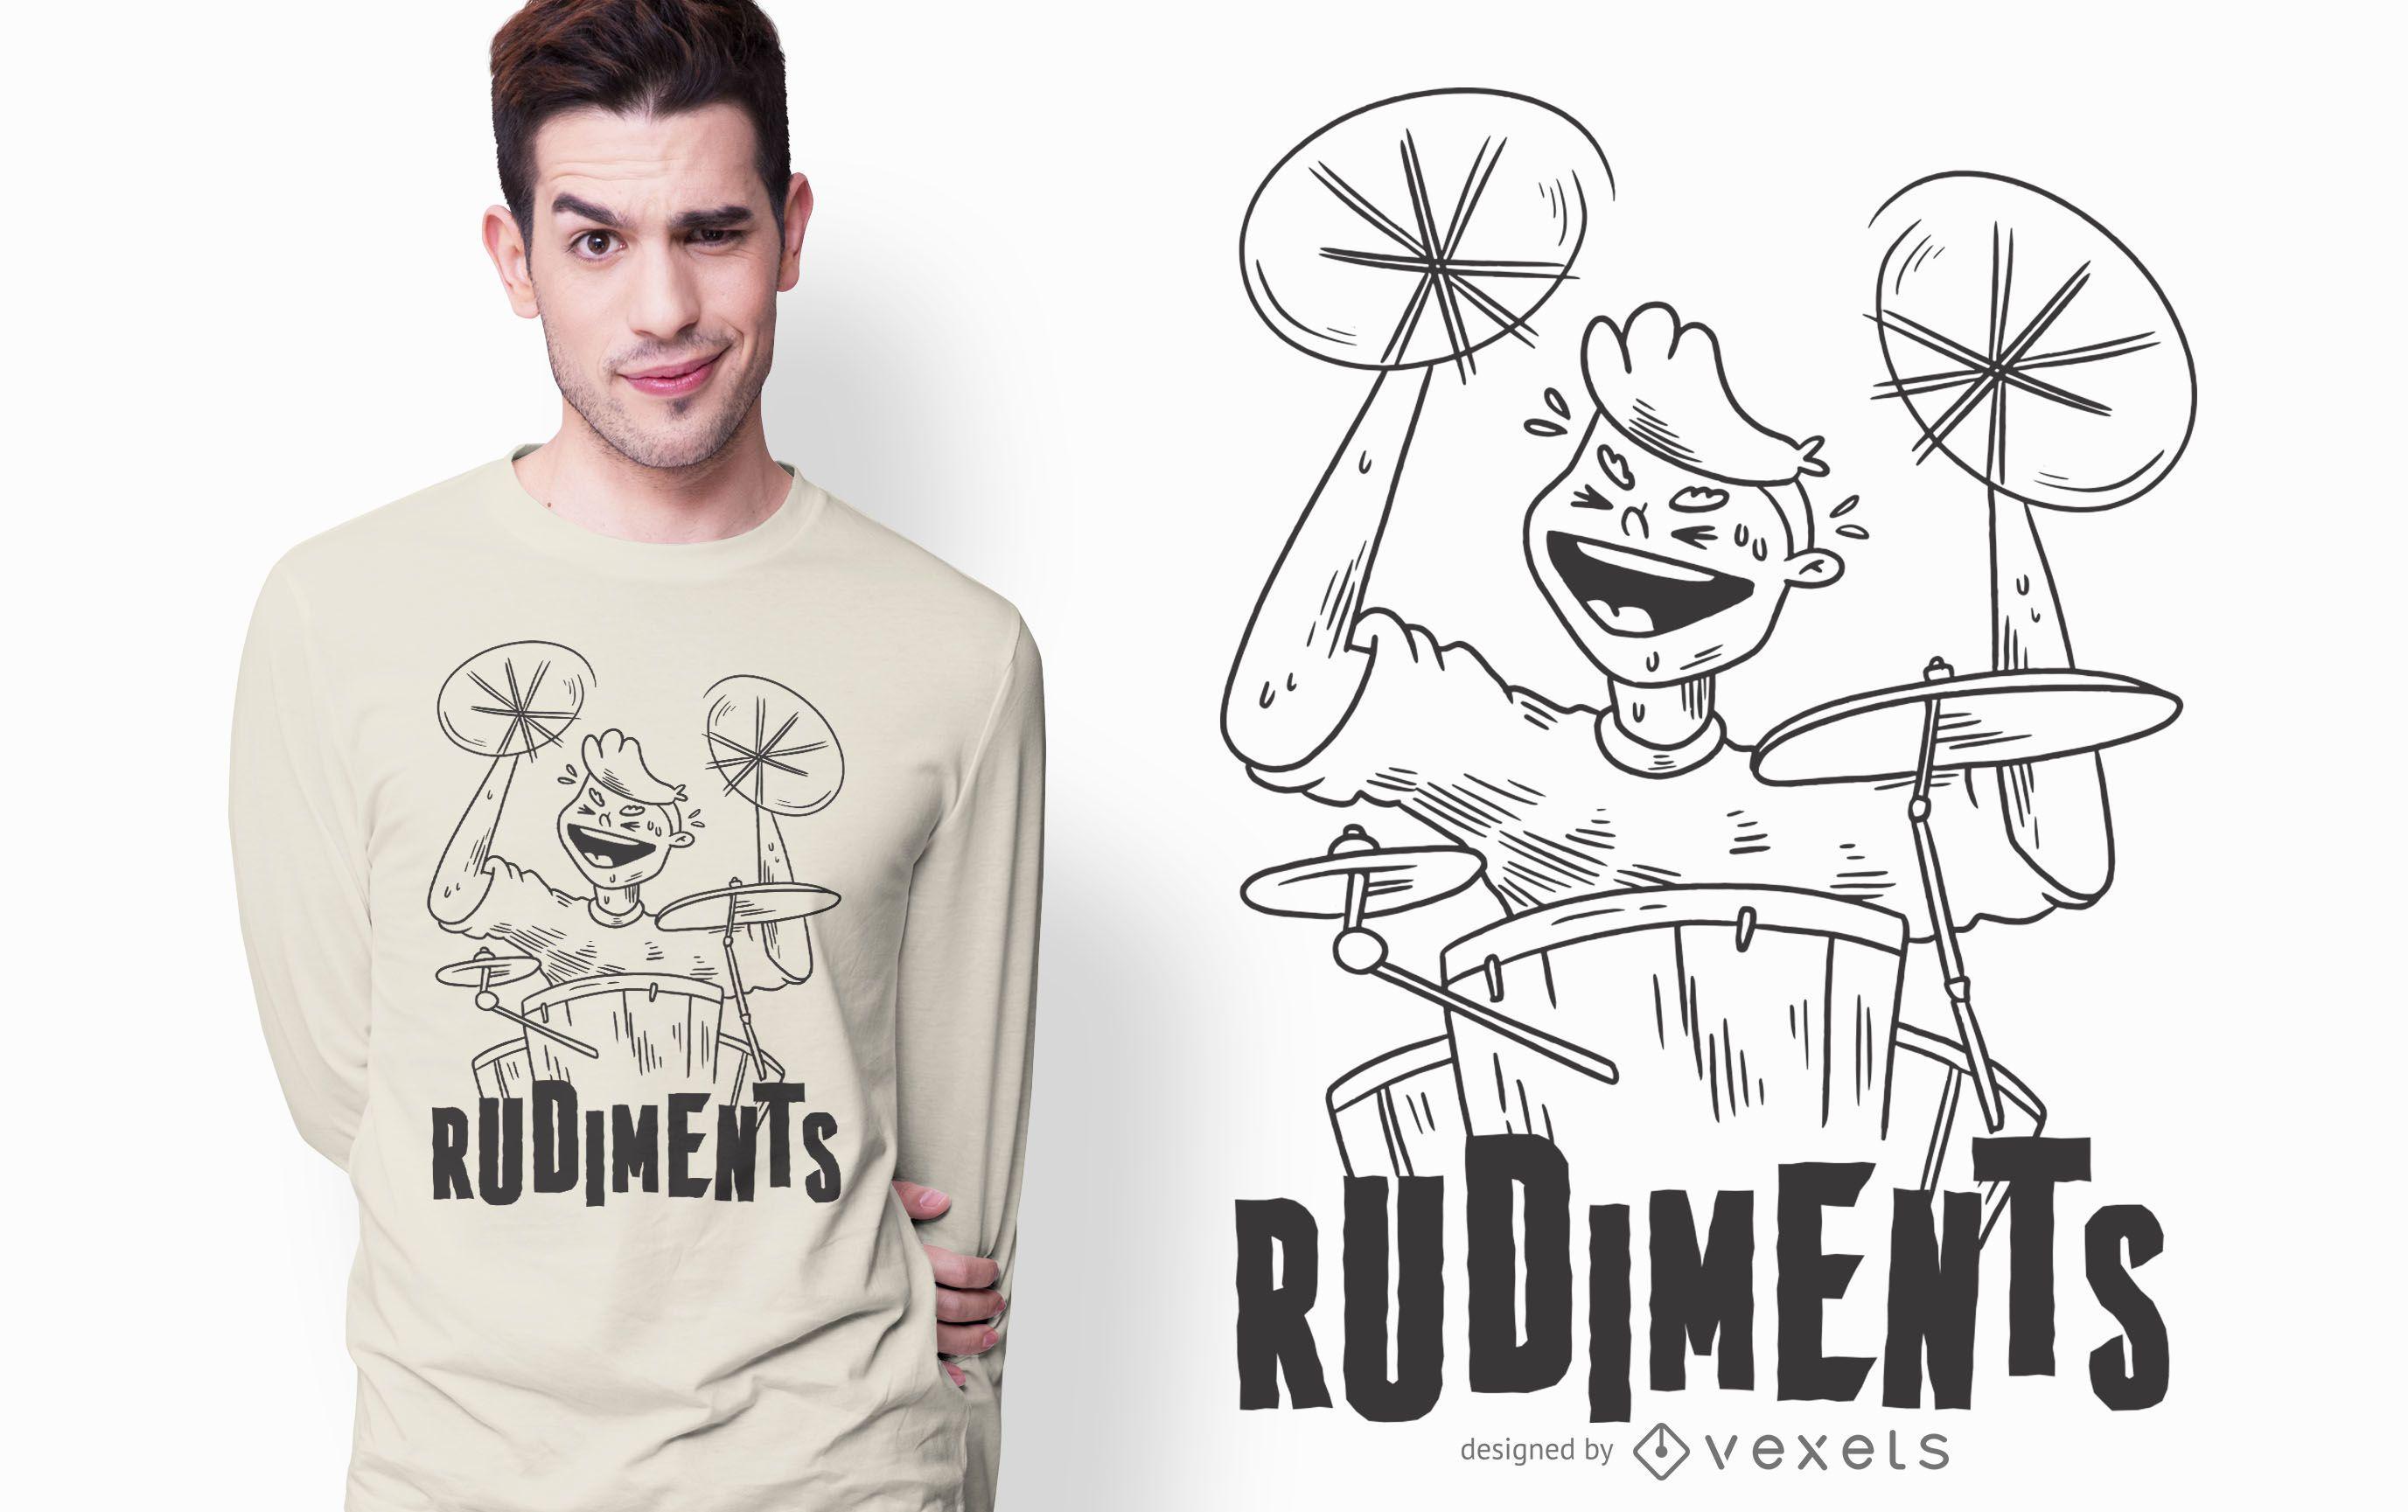 Dise?o de camiseta de rudimentos de tambor.